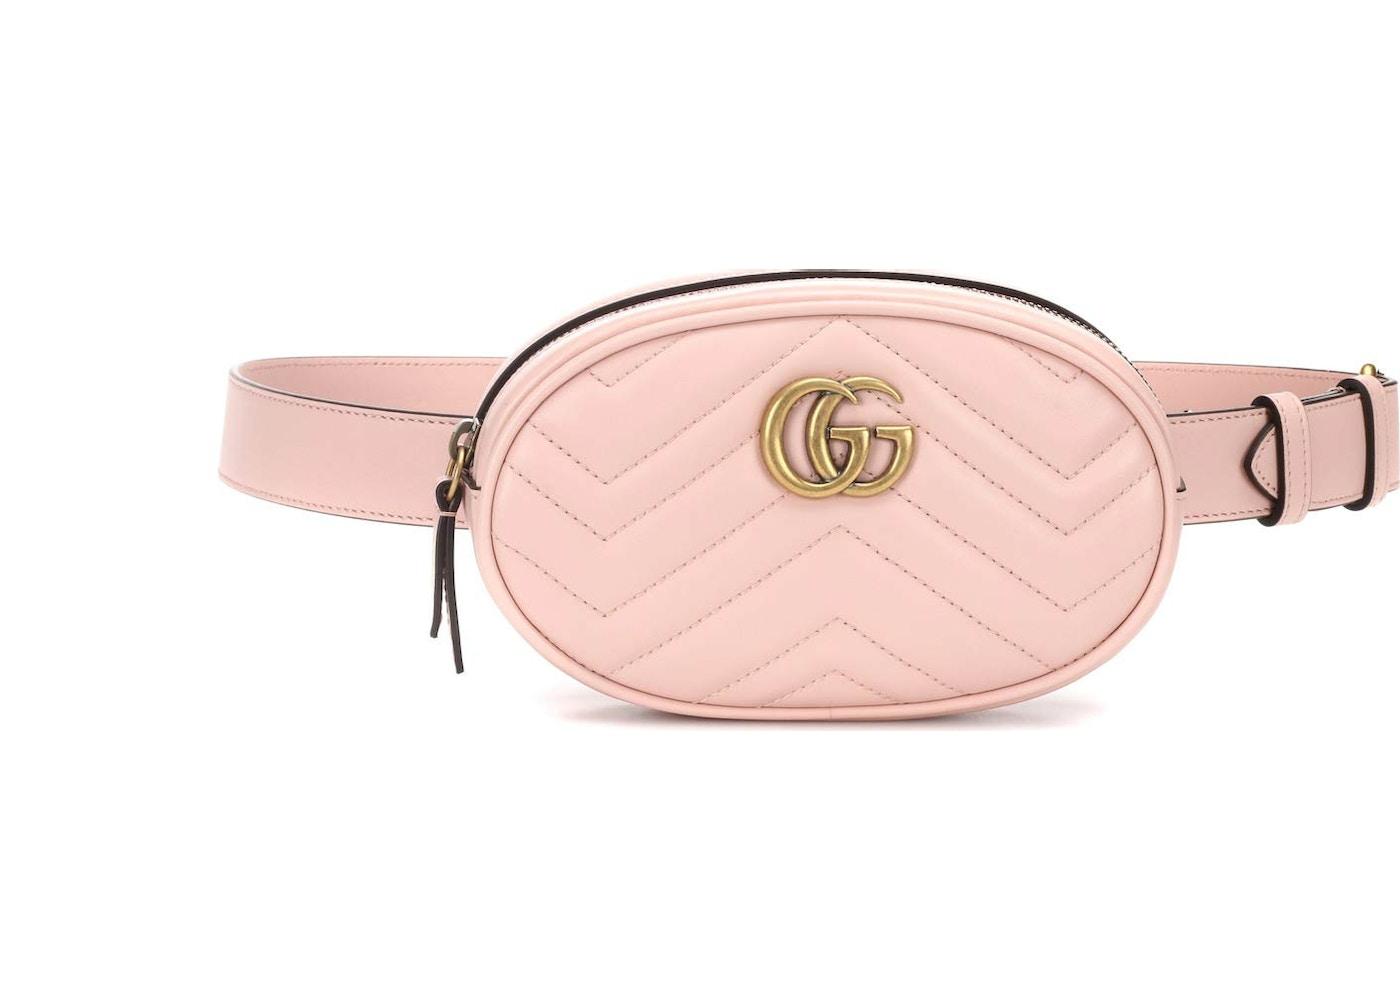 d13cf21cc Gucci Marmont Belt Bag Matelasse GG Rosa. Matelasse GG Rosa